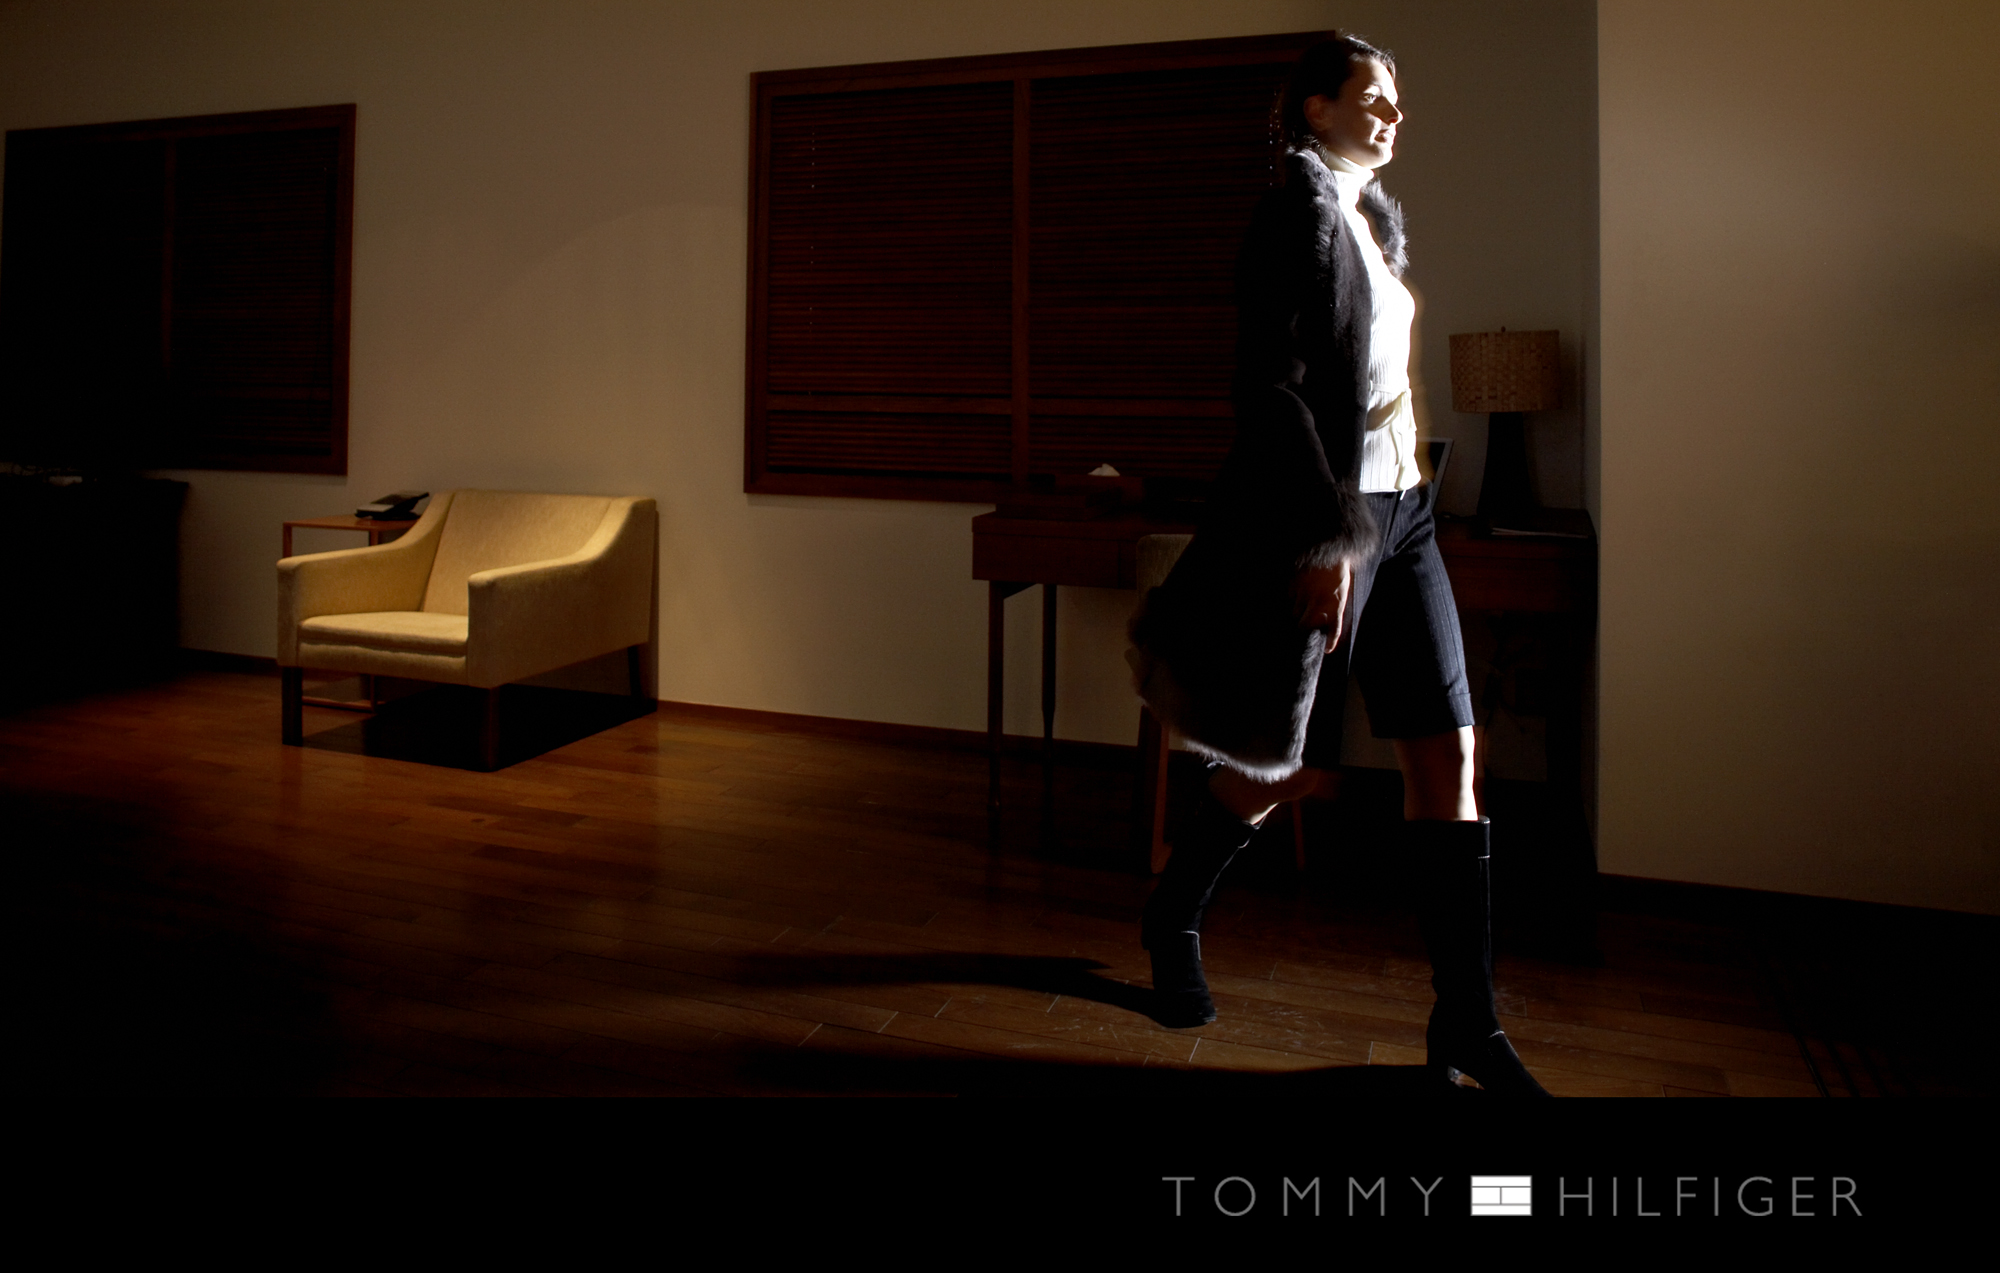 tommy filfiger